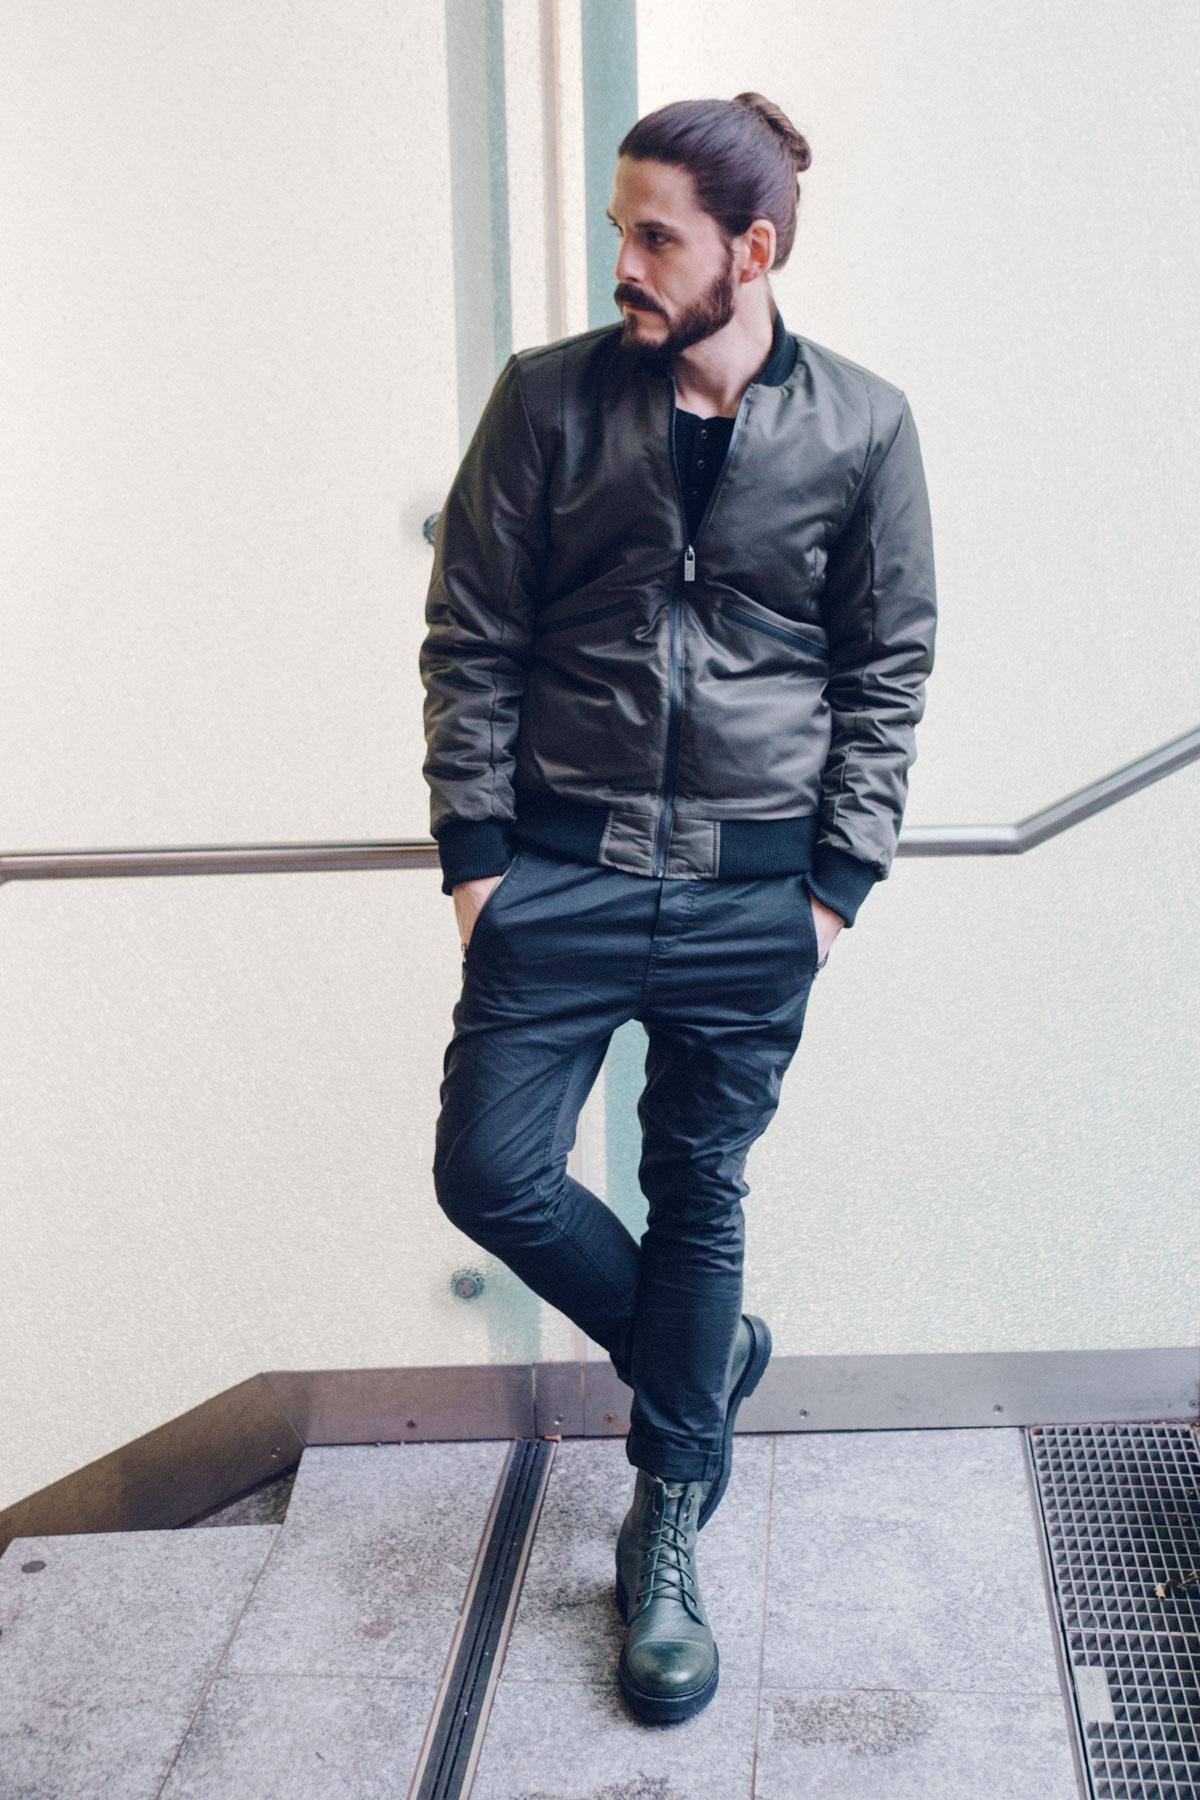 kaisers-neue-kleider-maennermodeblog-bomberjacke-boots-chino-skyrebel-winterlook-streetstyle